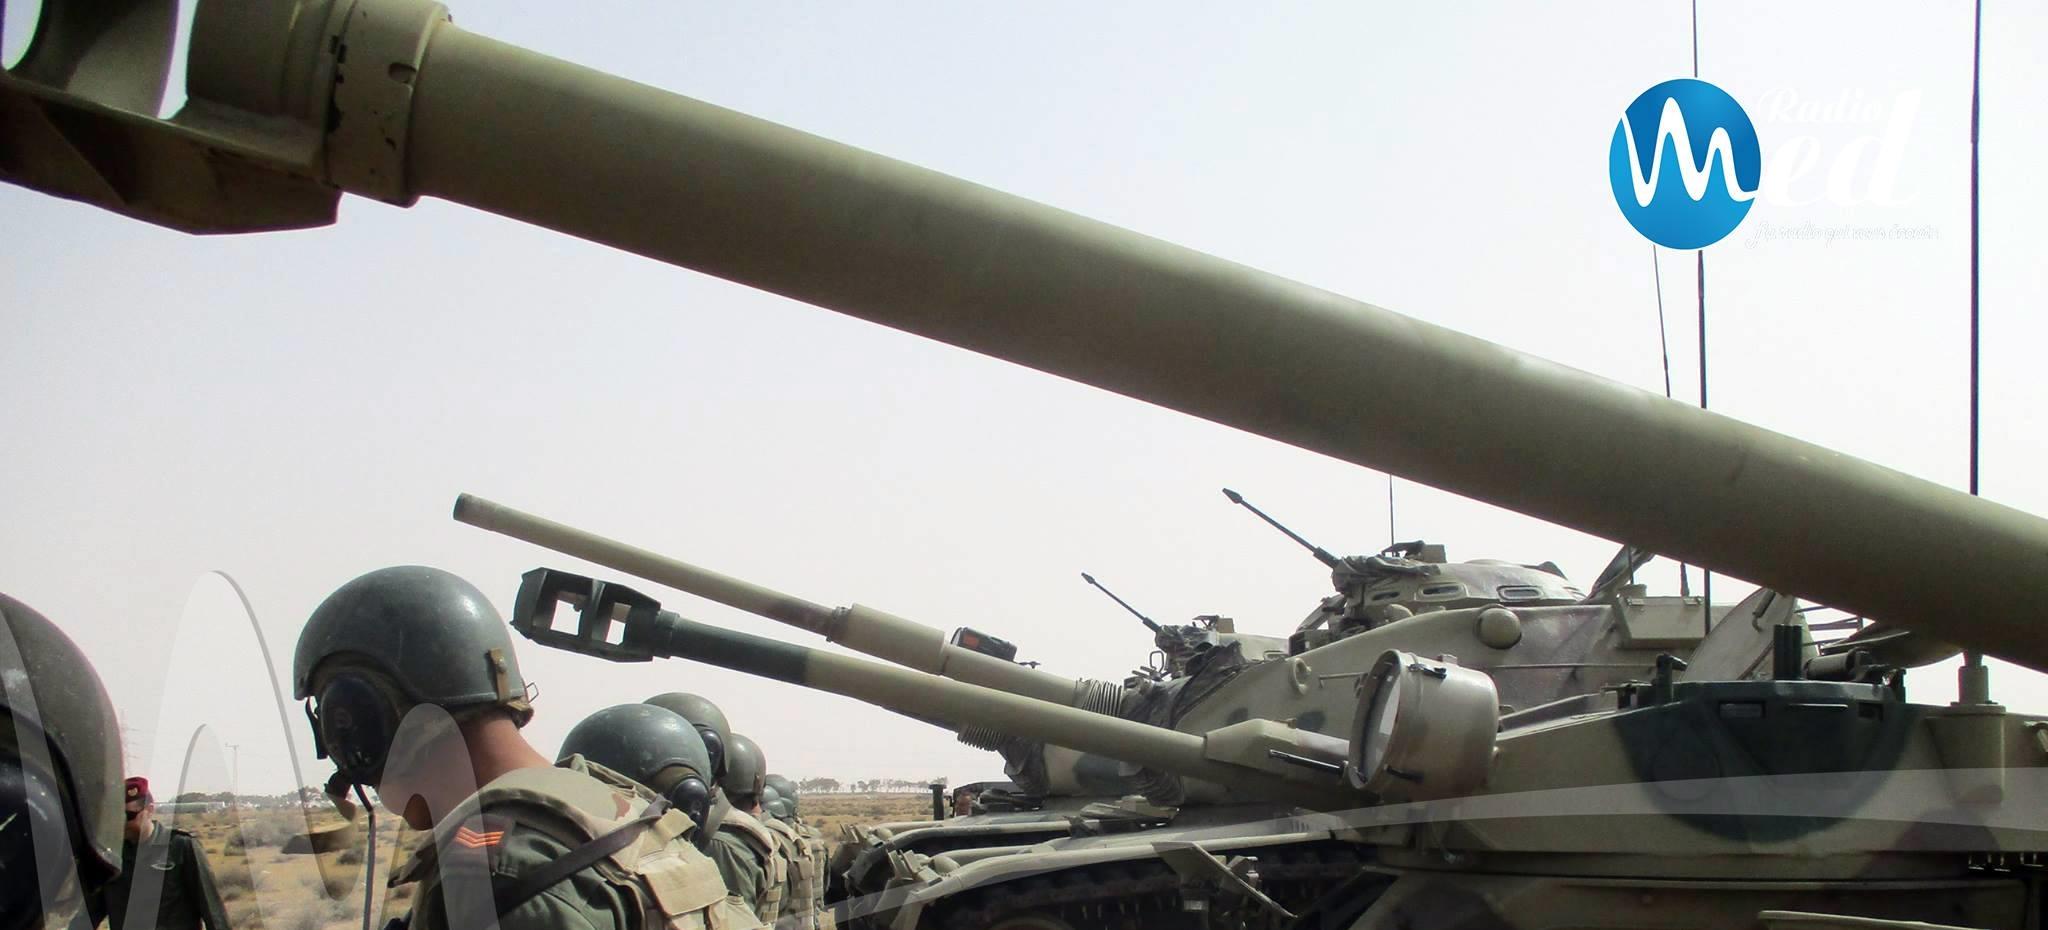 Armée Tunisienne / Tunisian Armed Forces / القوات المسلحة التونسية - Page 16 12998332-1122241314465032-4692575534702415538-o